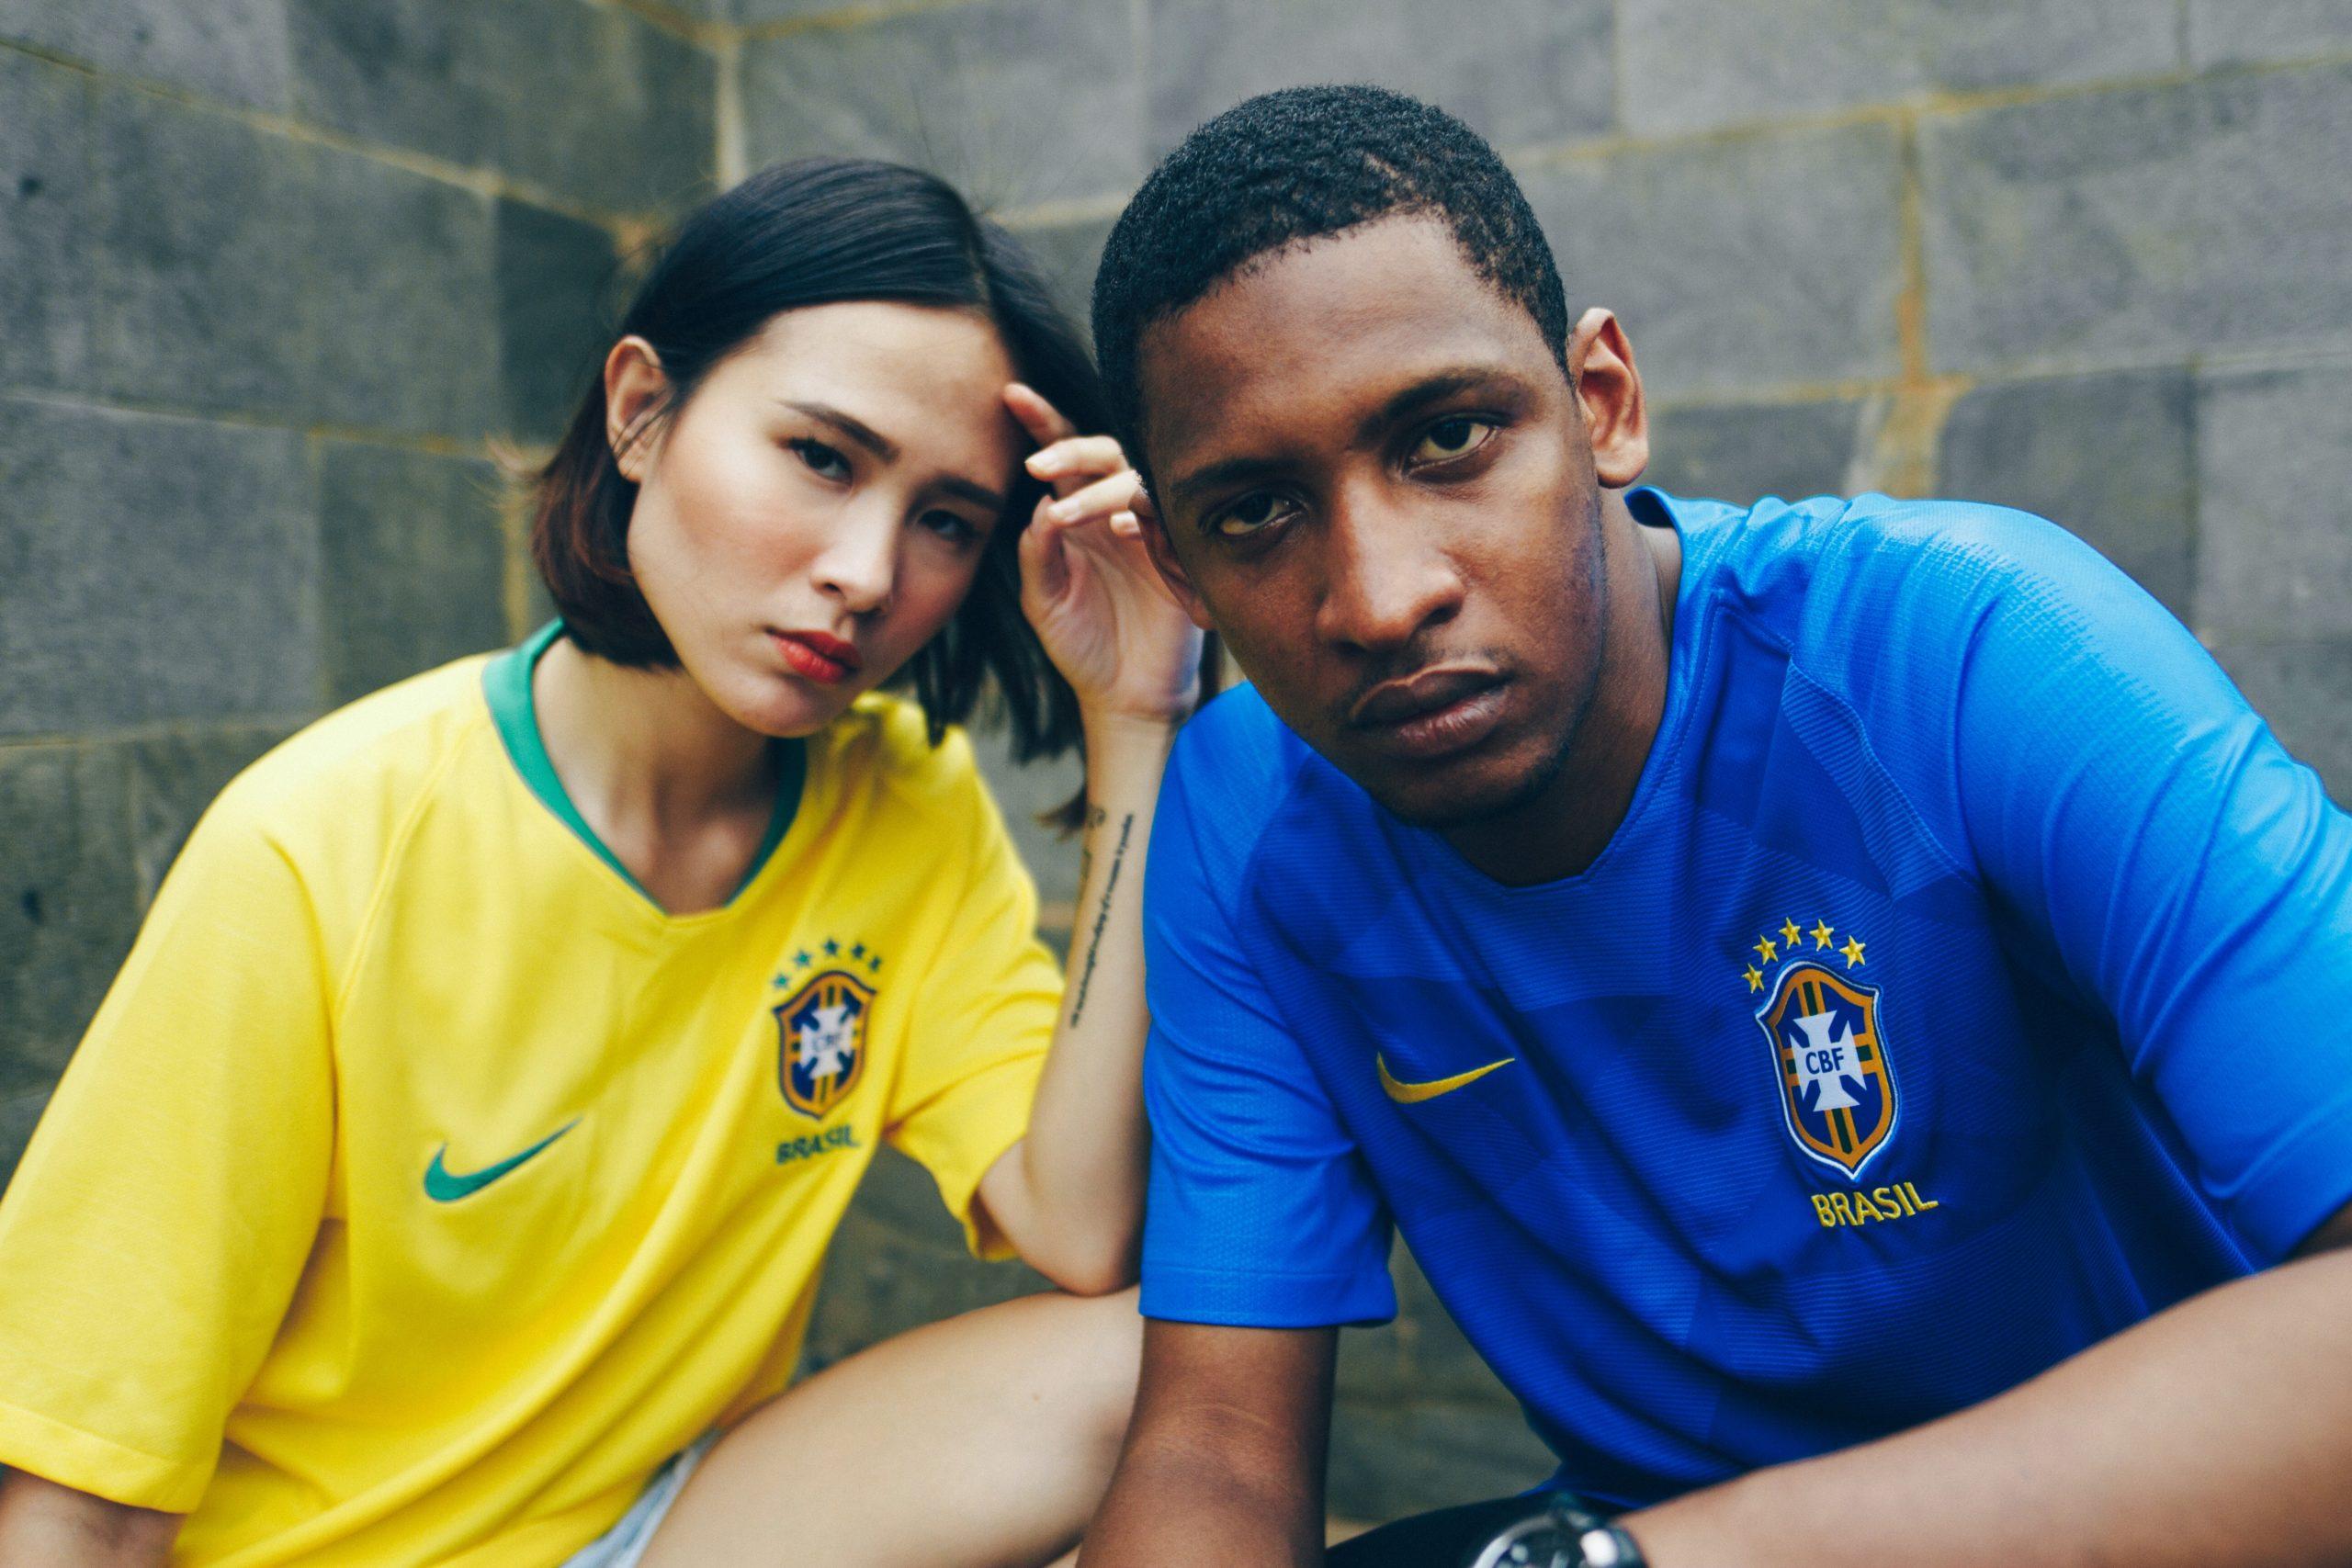 localization strategy in sport